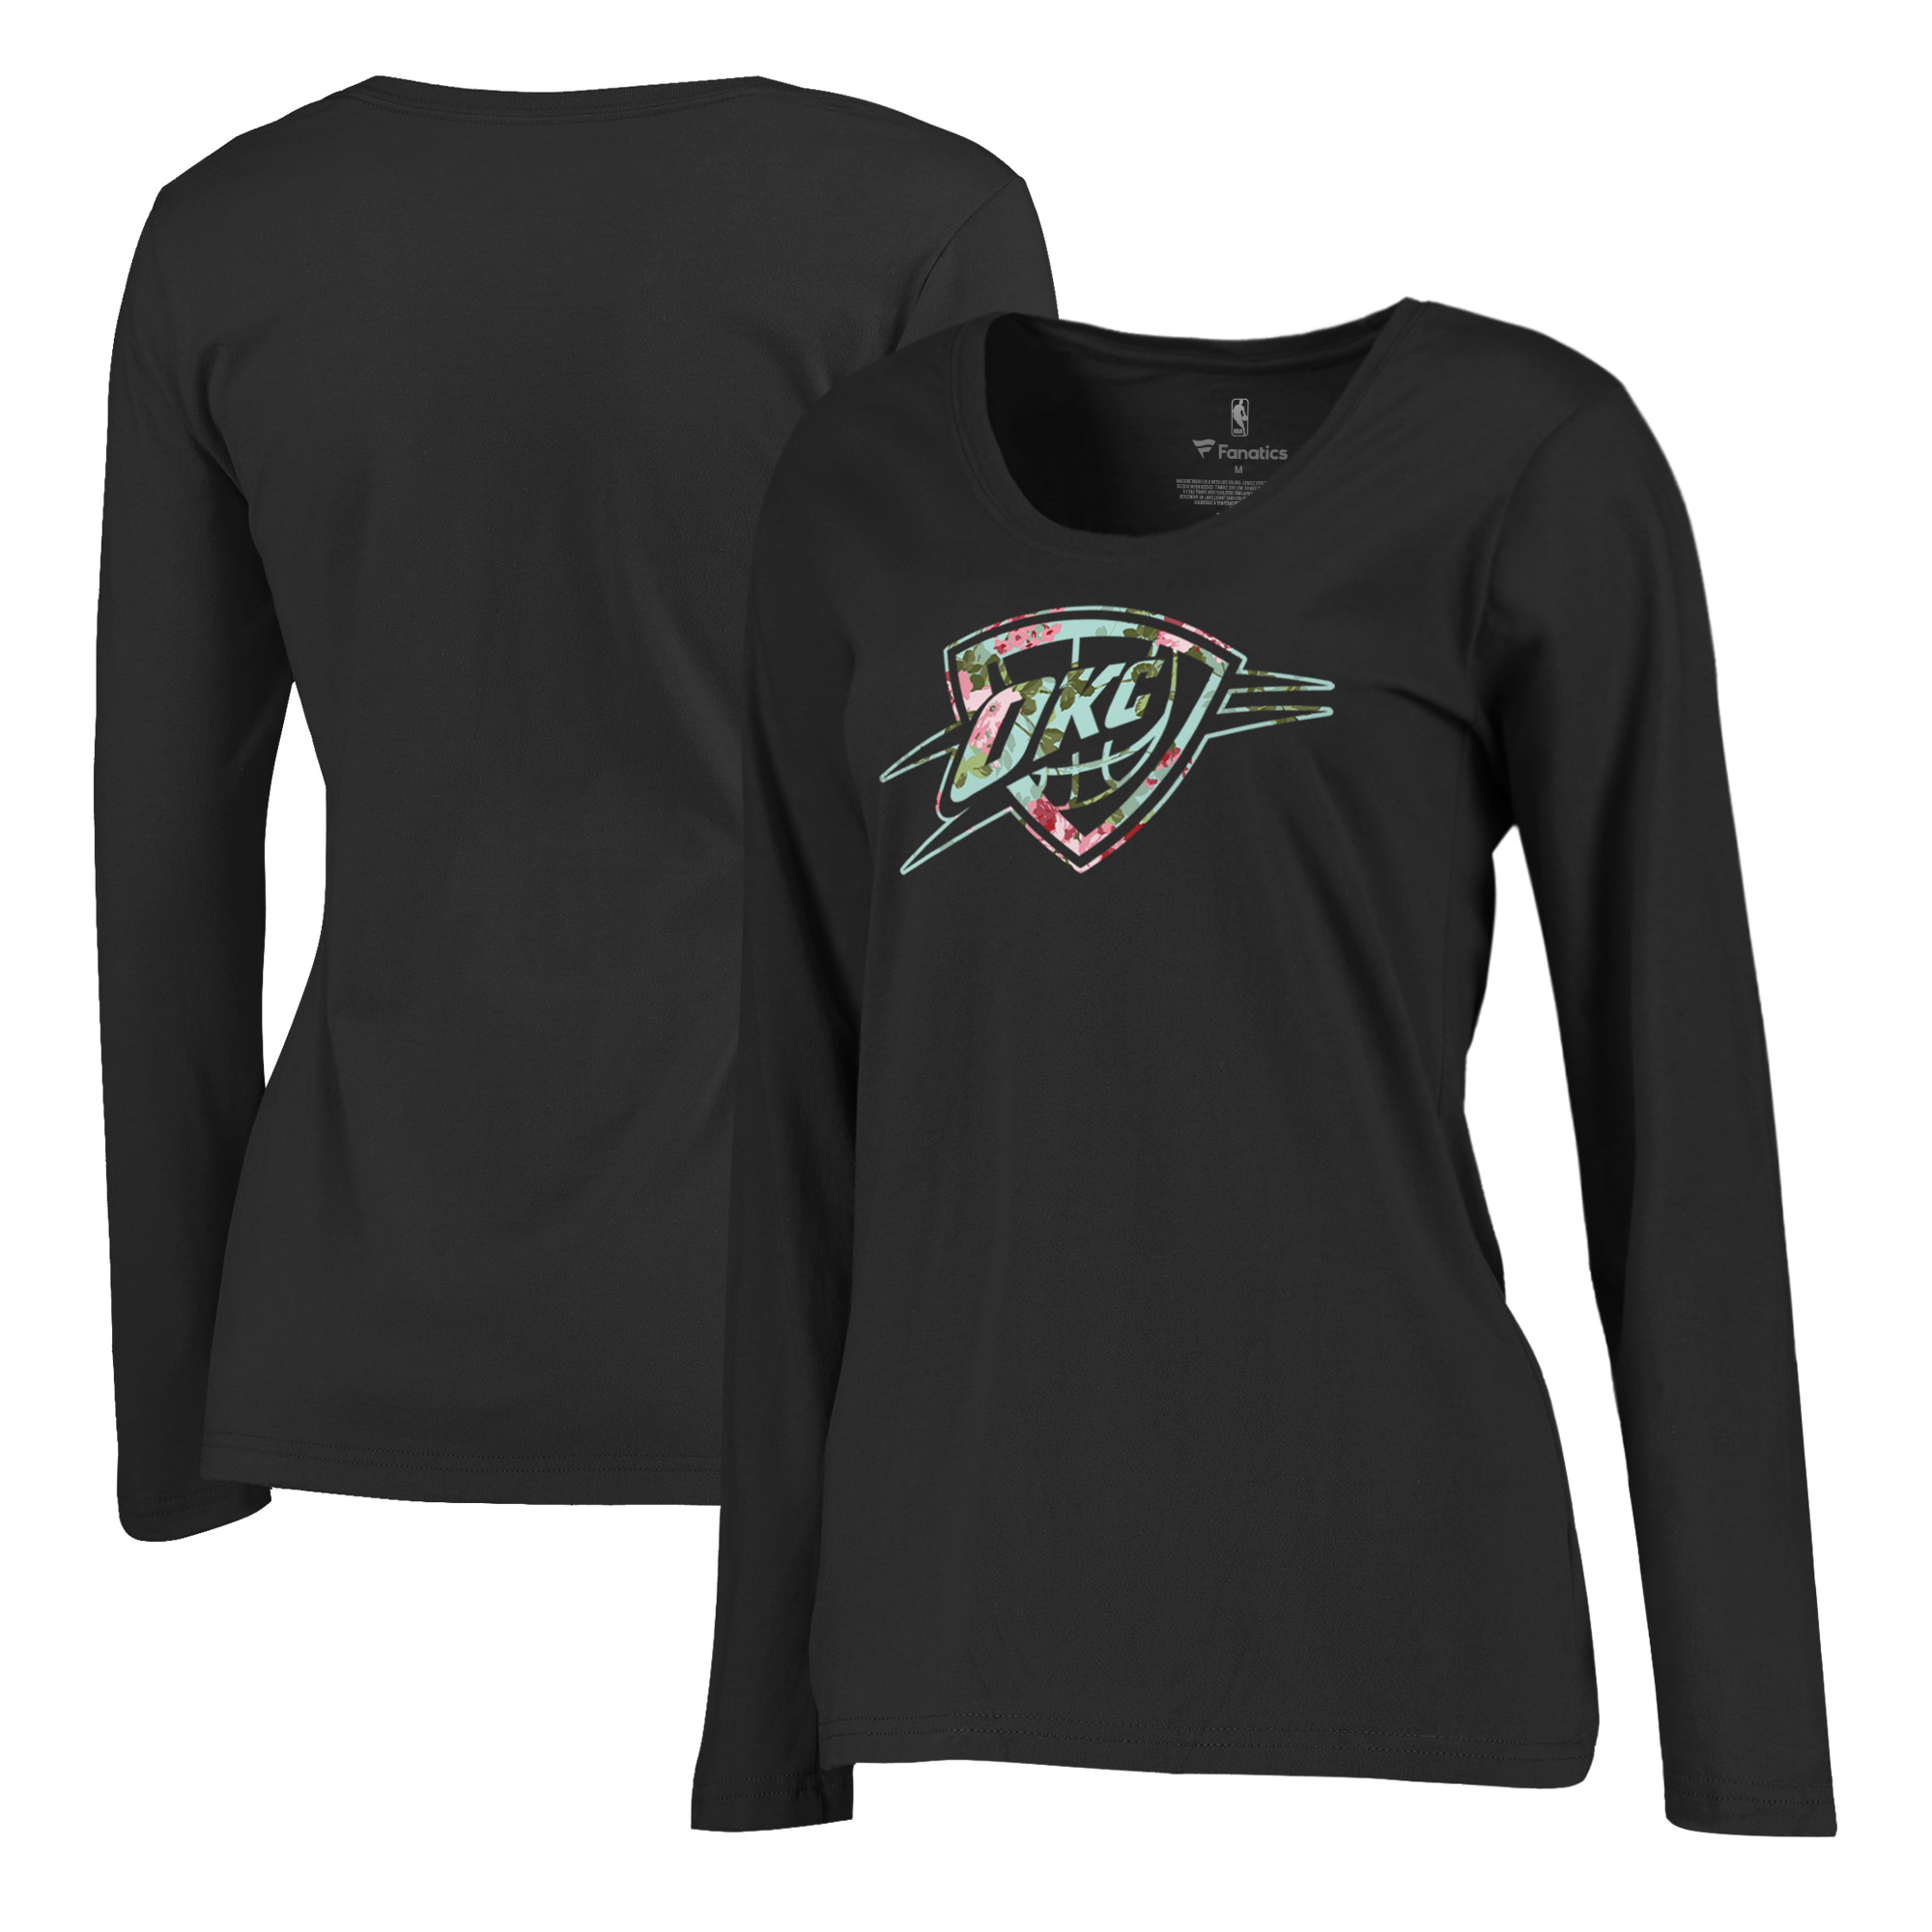 Oklahoma City Thunder Fanatics Branded Women's Lovely Plus Size Long Sleeve T-Shirt - Black